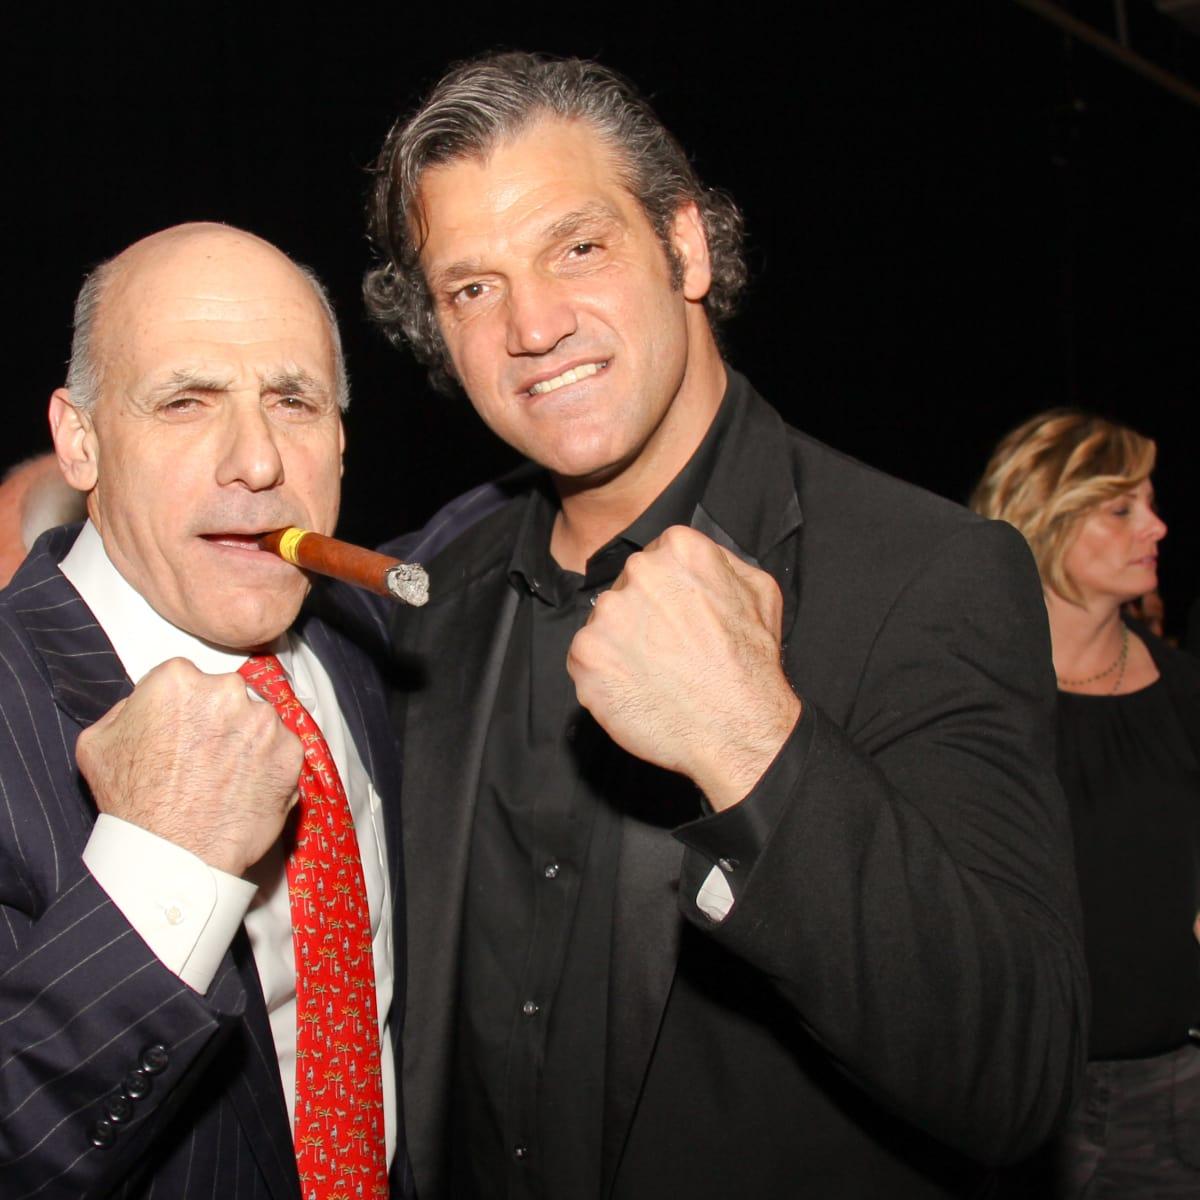 Houston, Black Tie Boxing Benefiting Lone Survivor Foundation, Feb 2017, Gregory Cokinos, Lou Savarese